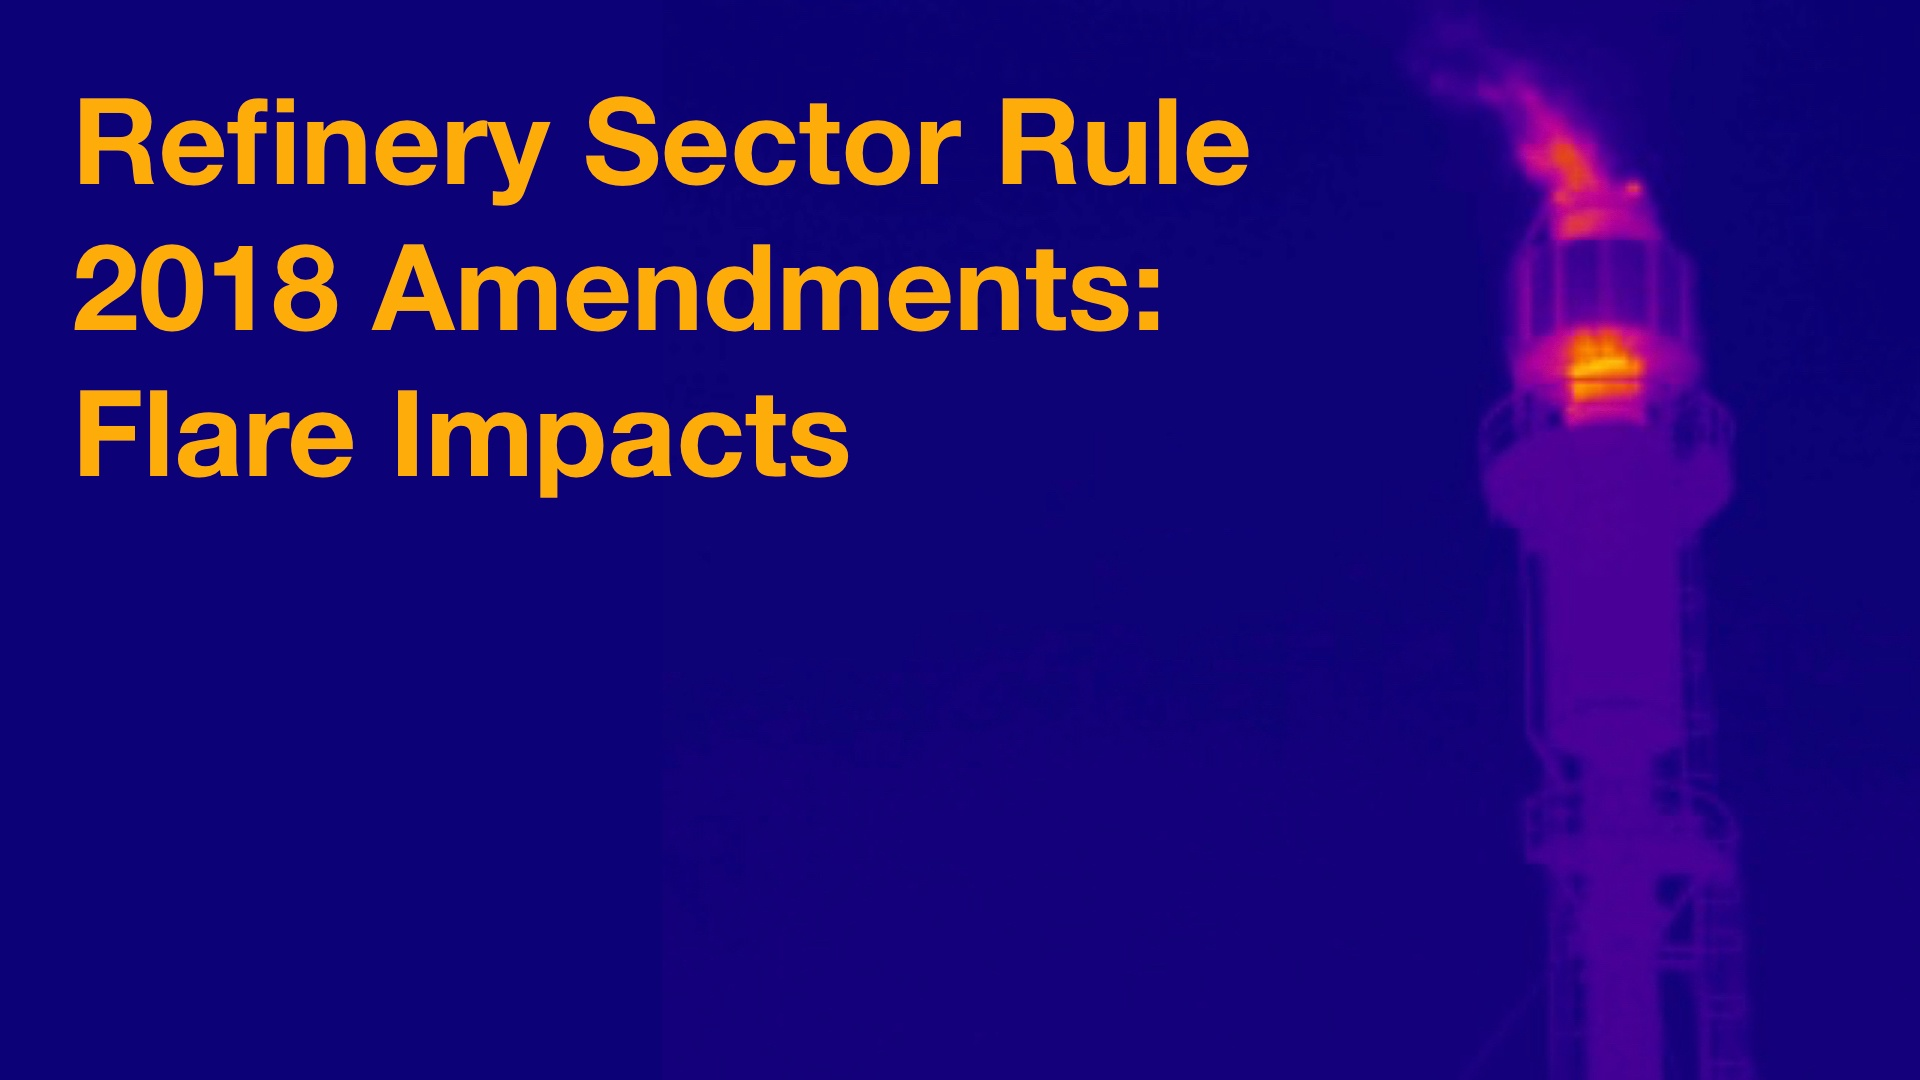 RSR Amendments 2018 Blog Pic.001-1.jpeg